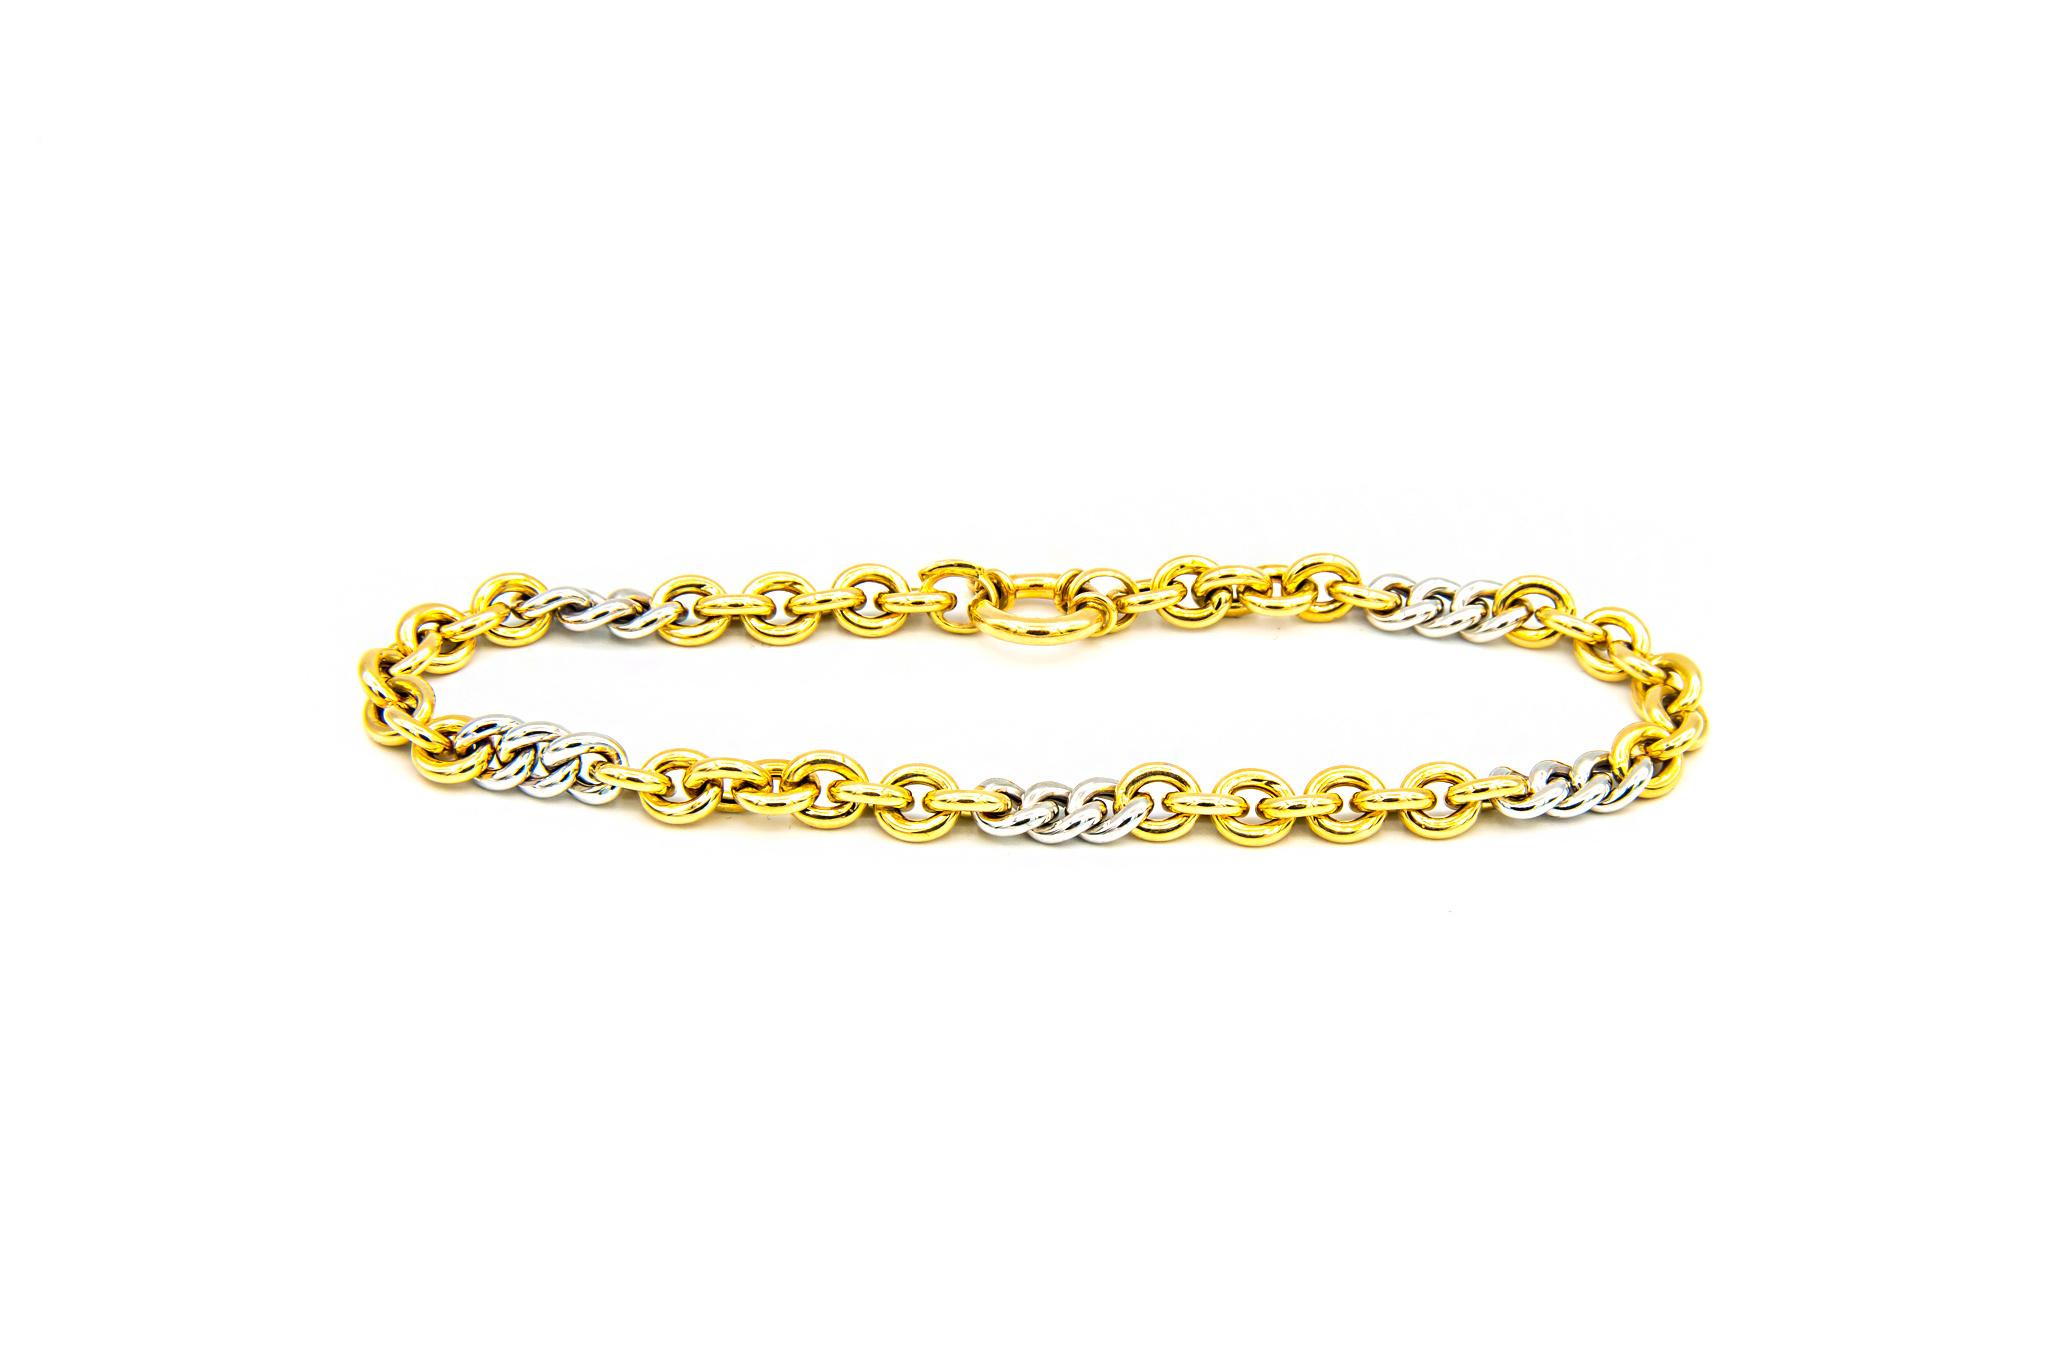 Armband anker-gourmet bicolor-2